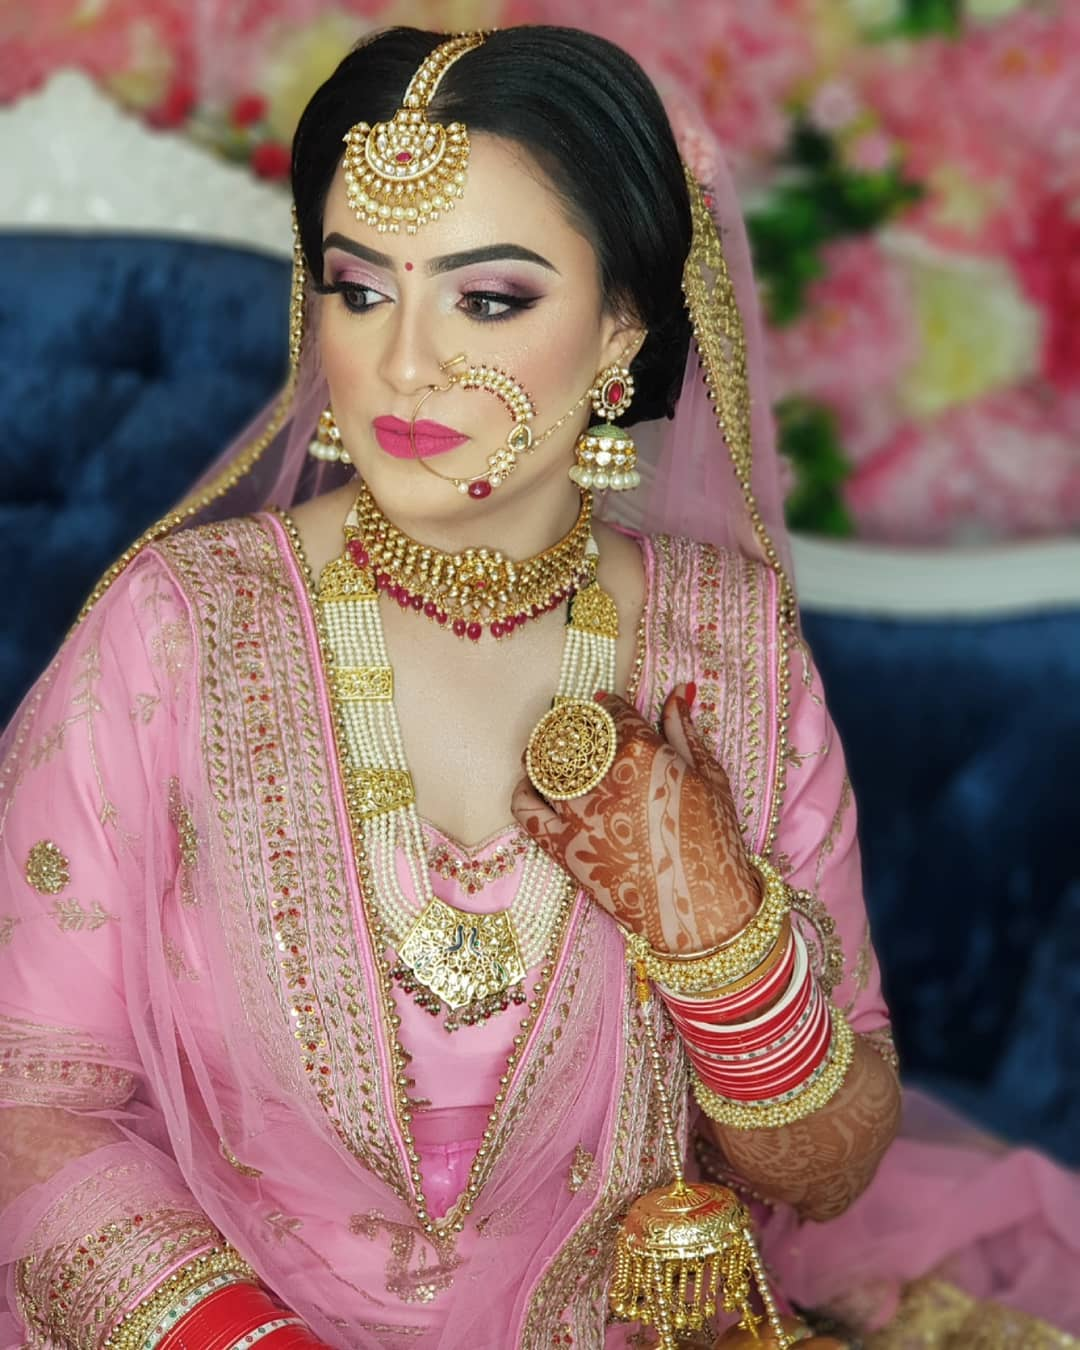 Indian Wedding Makeup Ideas To Look Like Celebs K4 Fashion